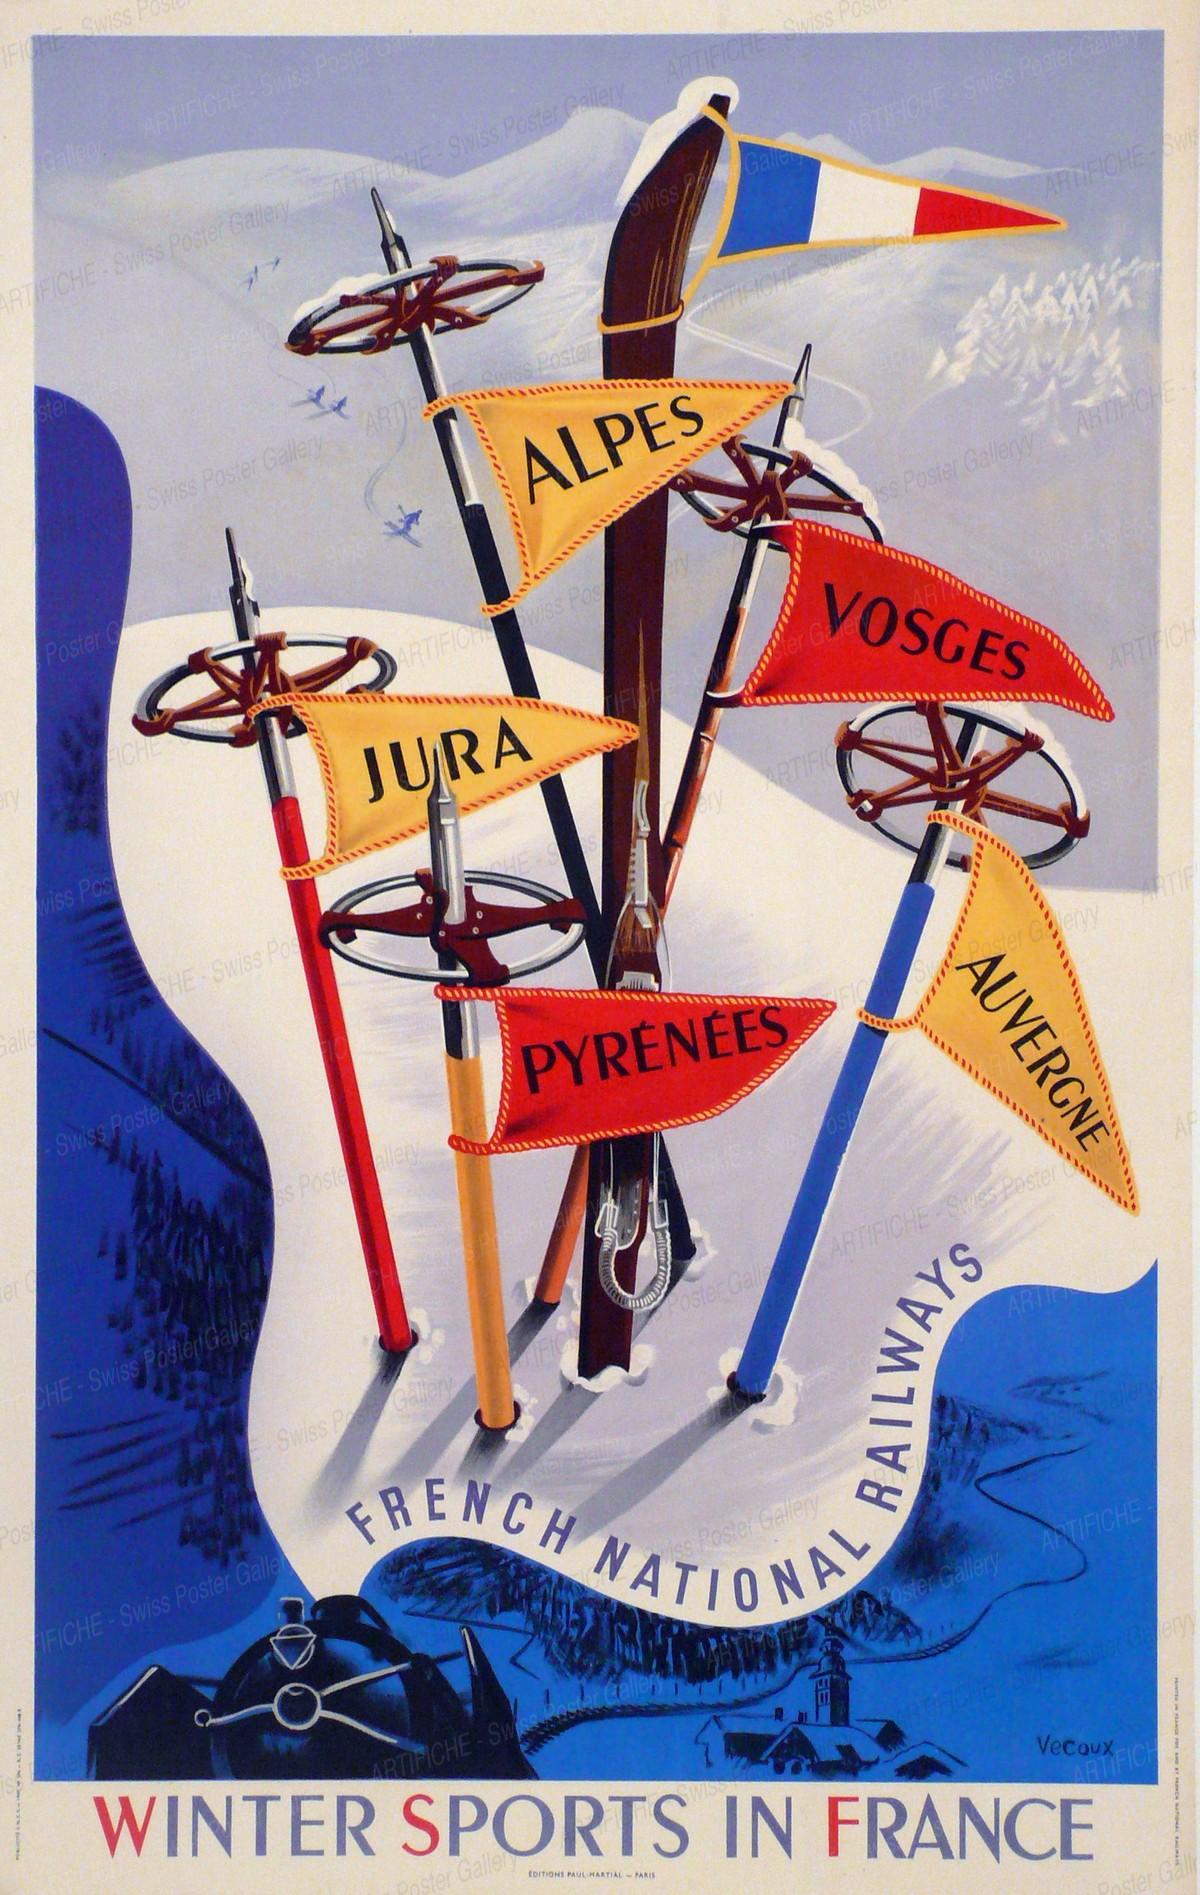 Winter Sports in France – French National Railways – Alpes – Vosges – Jura – Pyrénées – Auvergne, Vecoux